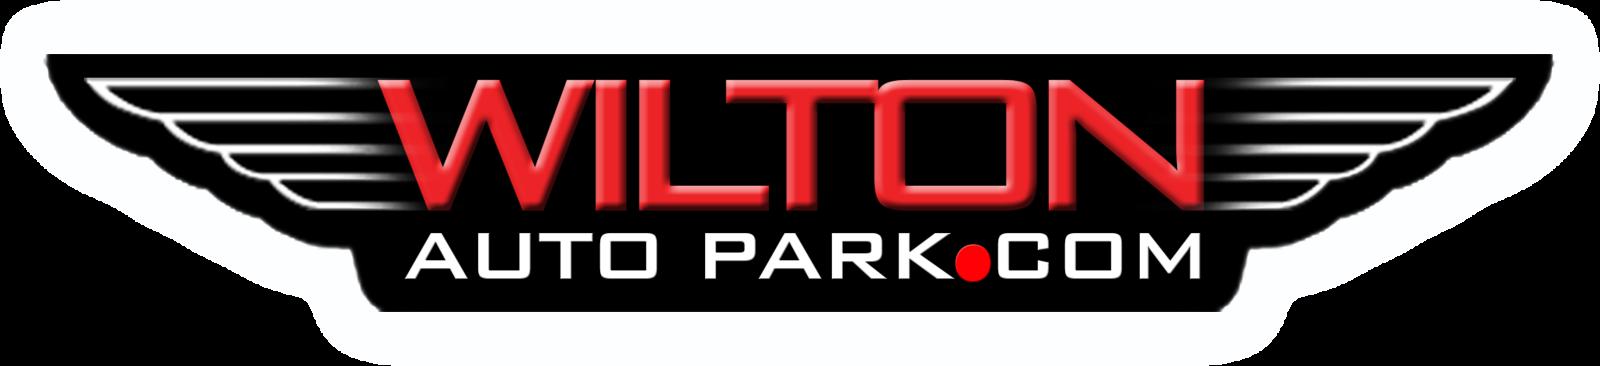 Wilton Auto Park Wilton Ct Read Consumer Reviews